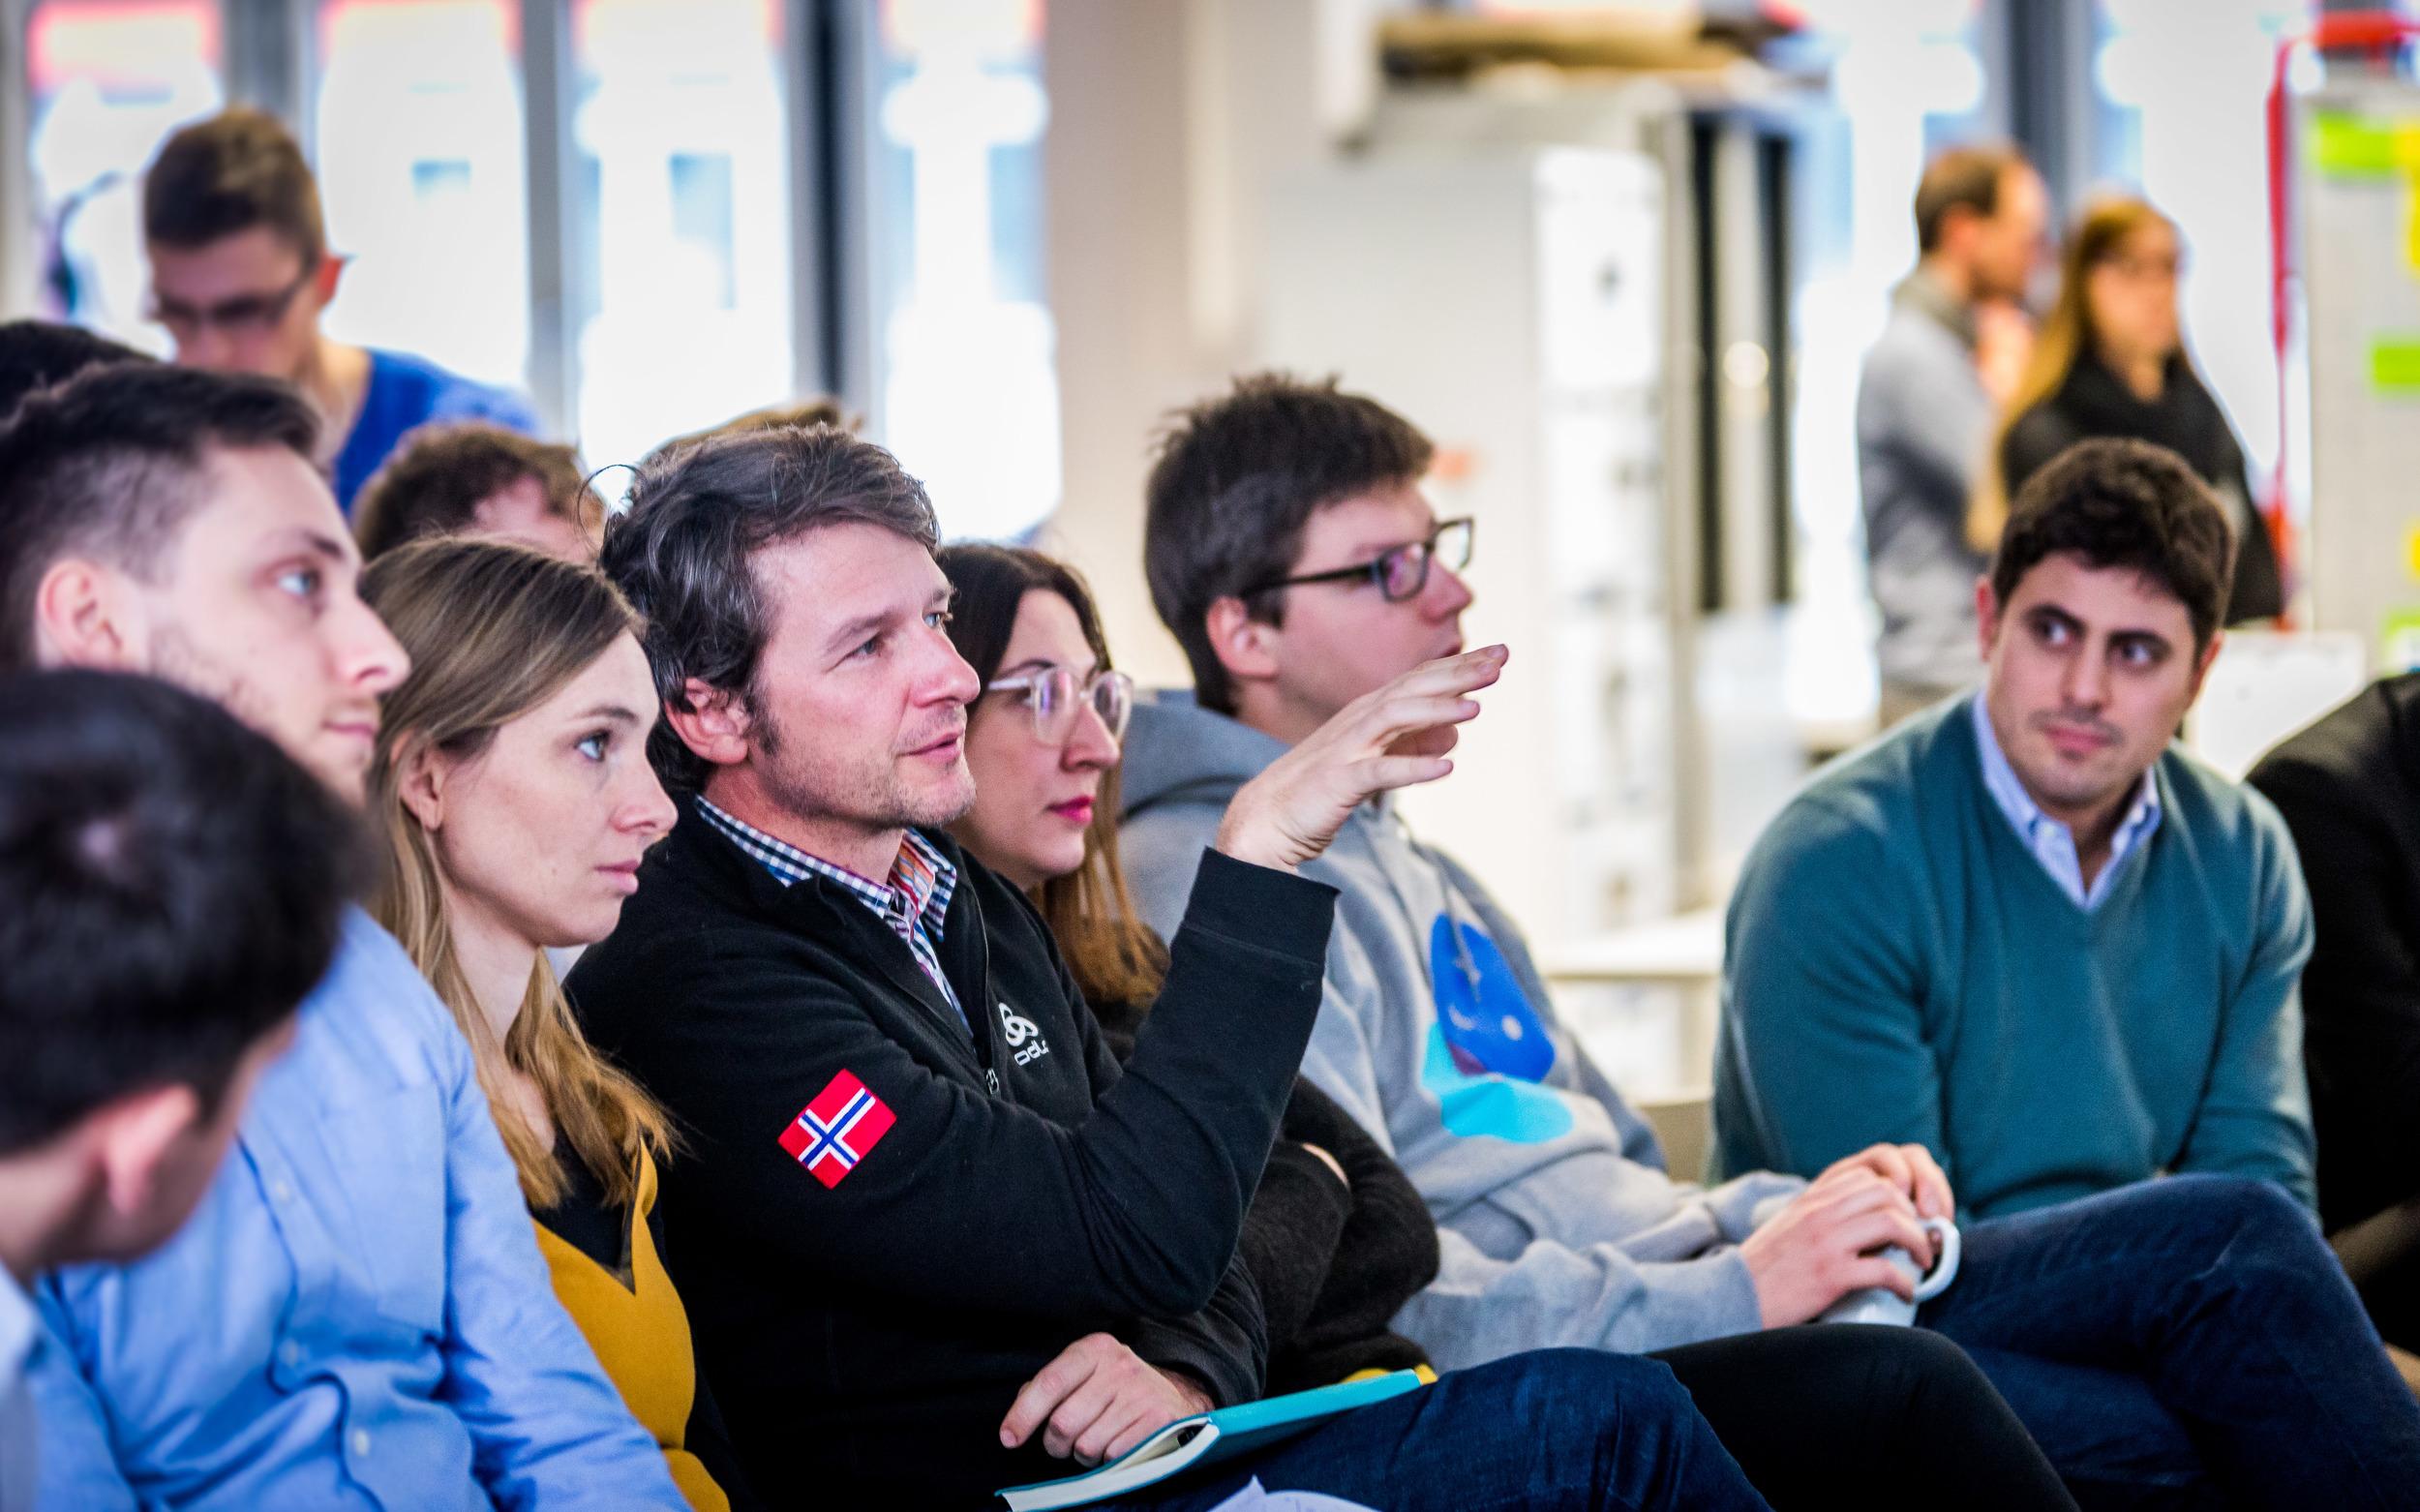 accelereren digital marketing startups met Axel Springer Plug and Play